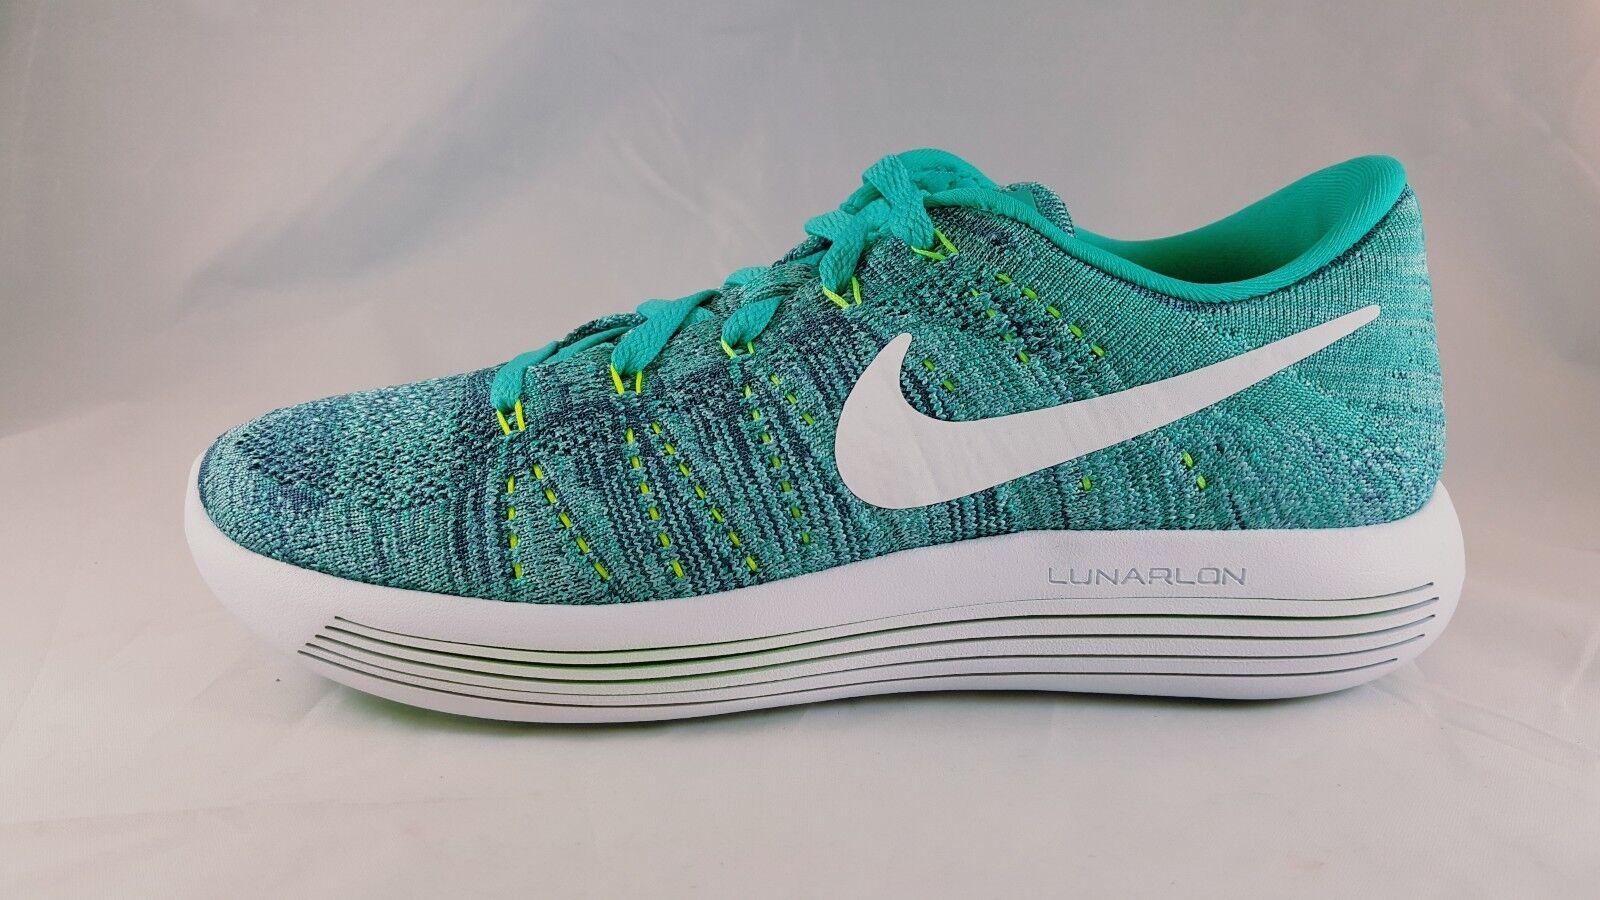 Nike lunarepic basso flyknit le scarpe da corsa 843765 301 46